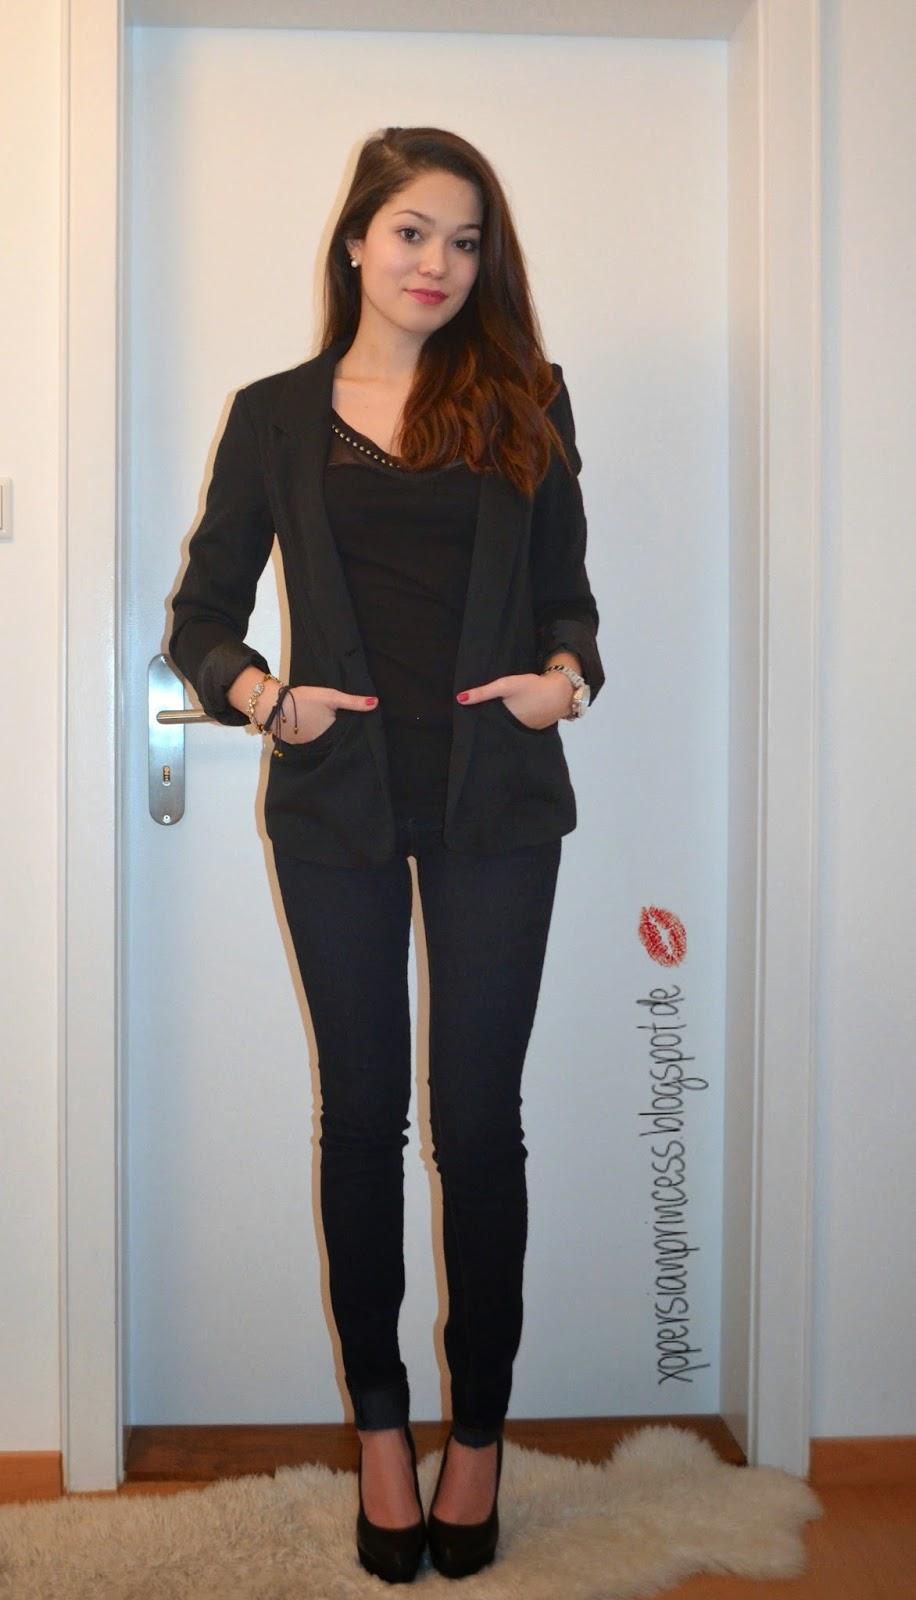 Selin Mina Modeblog Aus Munchen Fashionblog From Munich